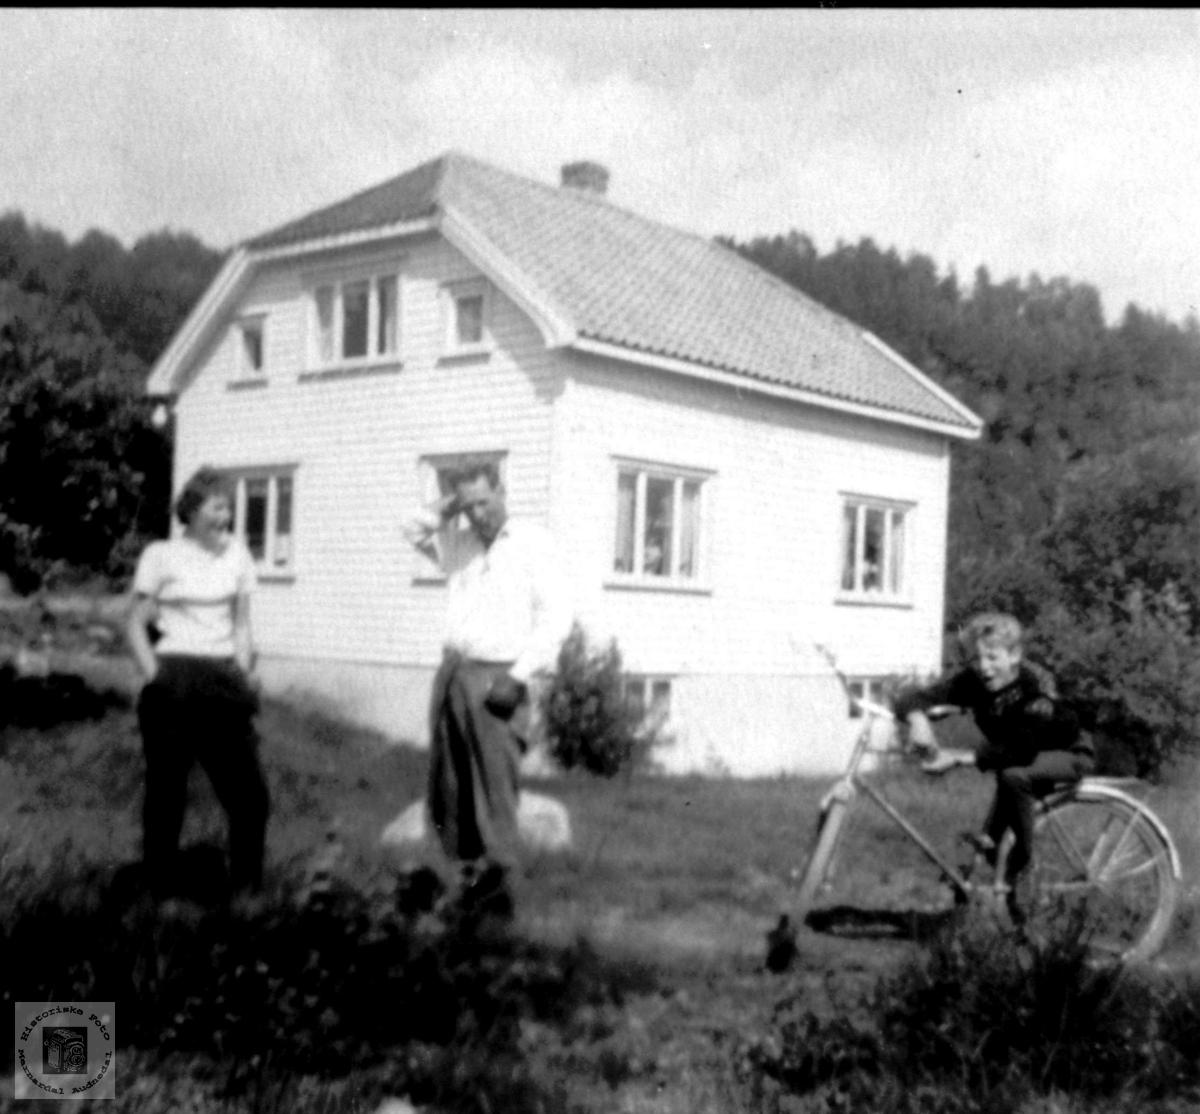 Hus. Bygd 1954, Lian, Øvre Laudal.